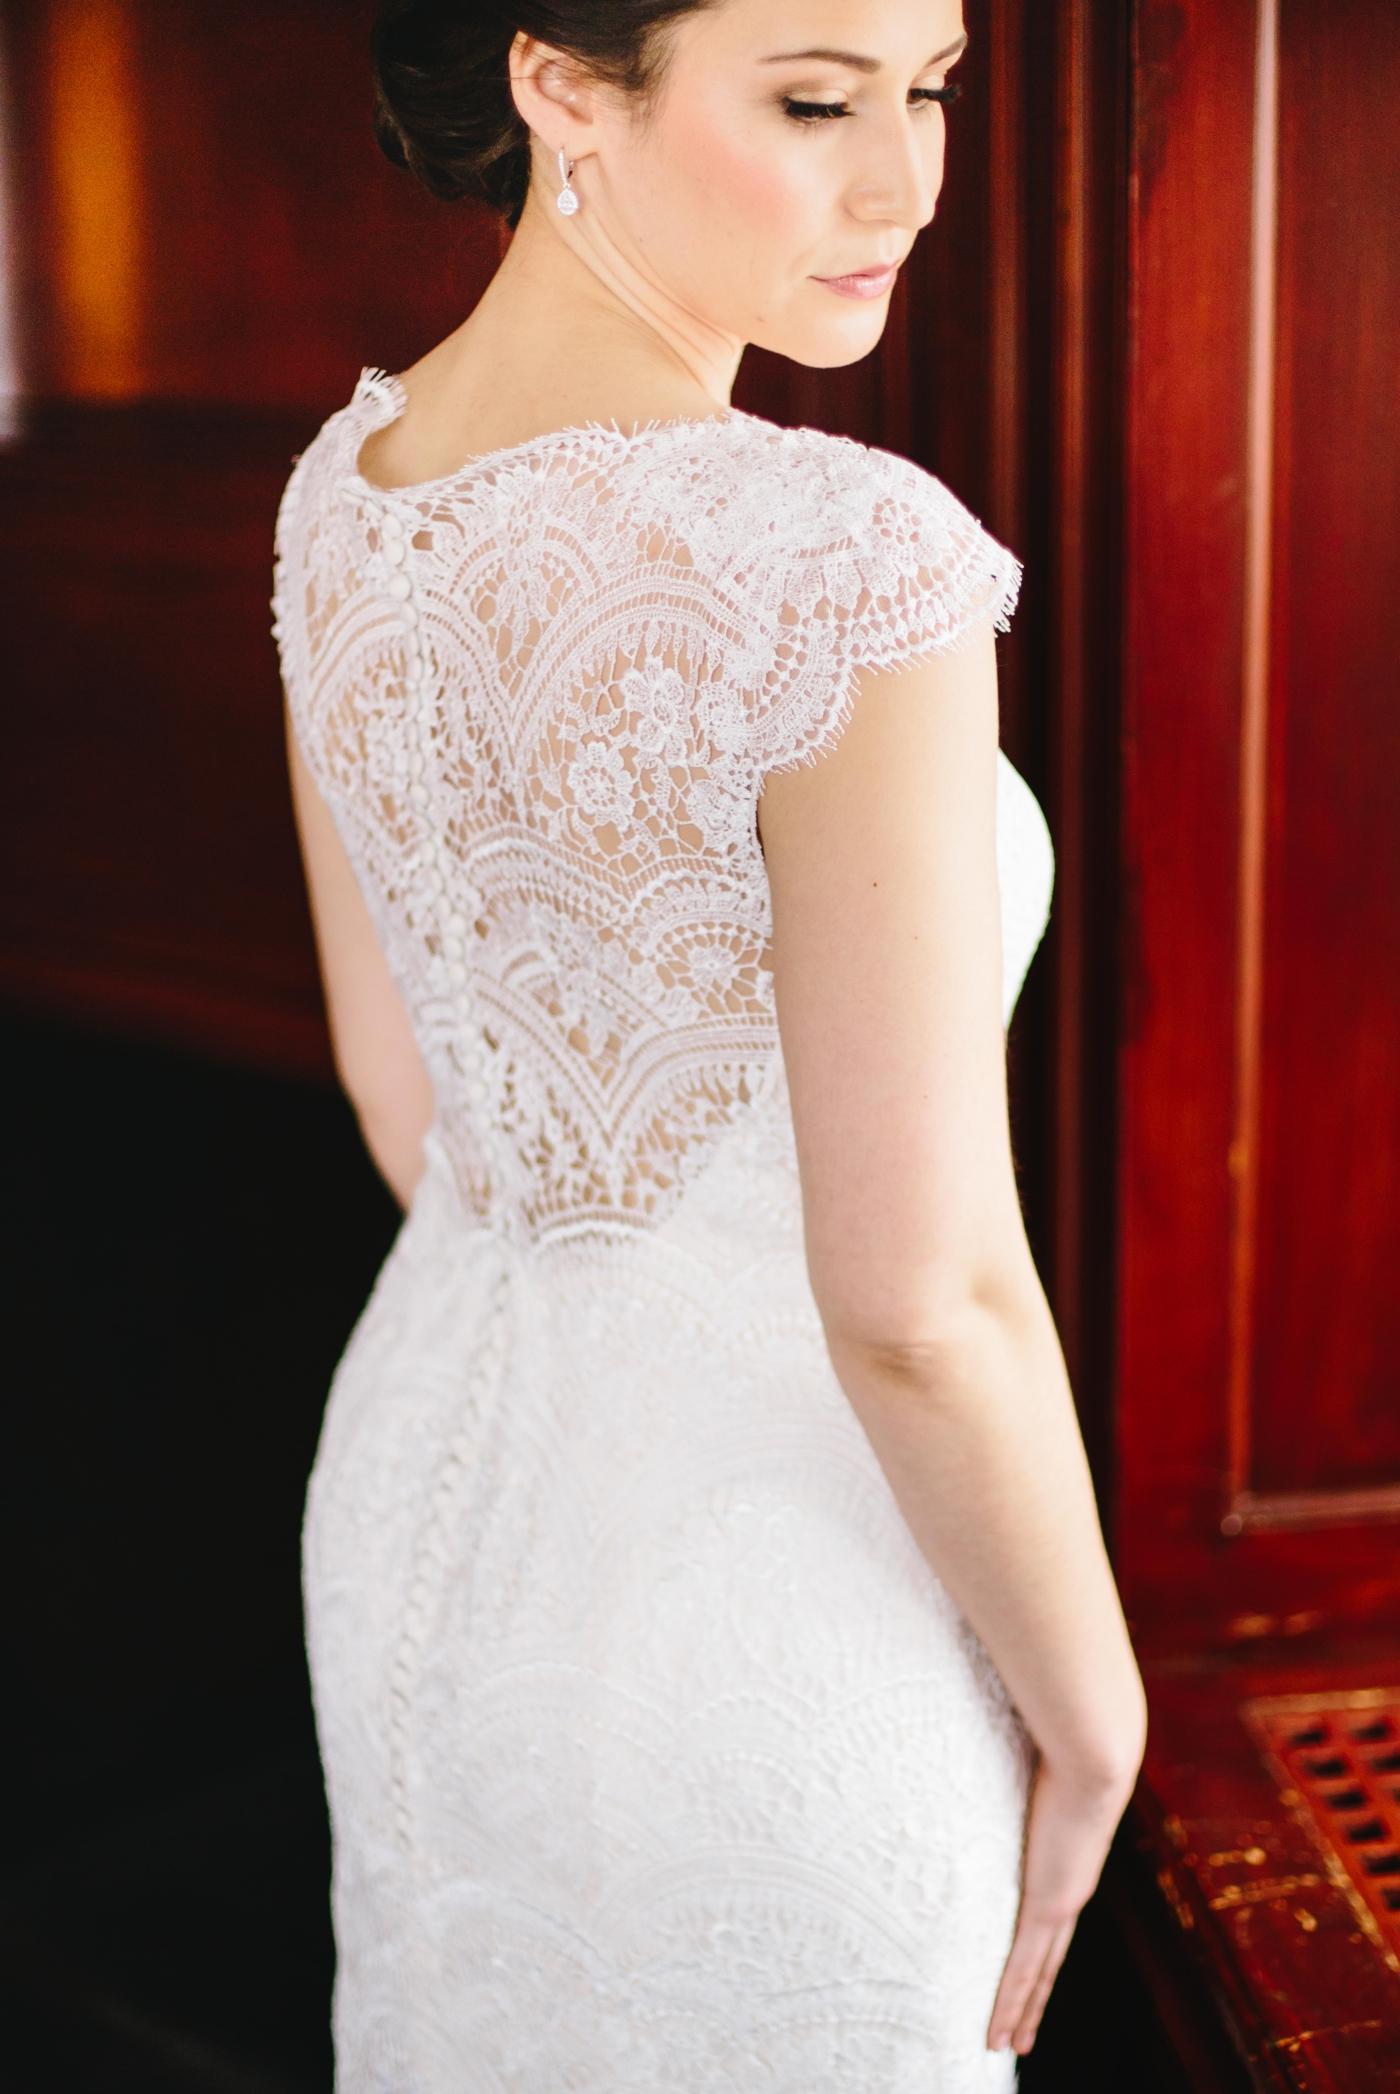 chicago-fine-art-wedding-photography-lintelman9